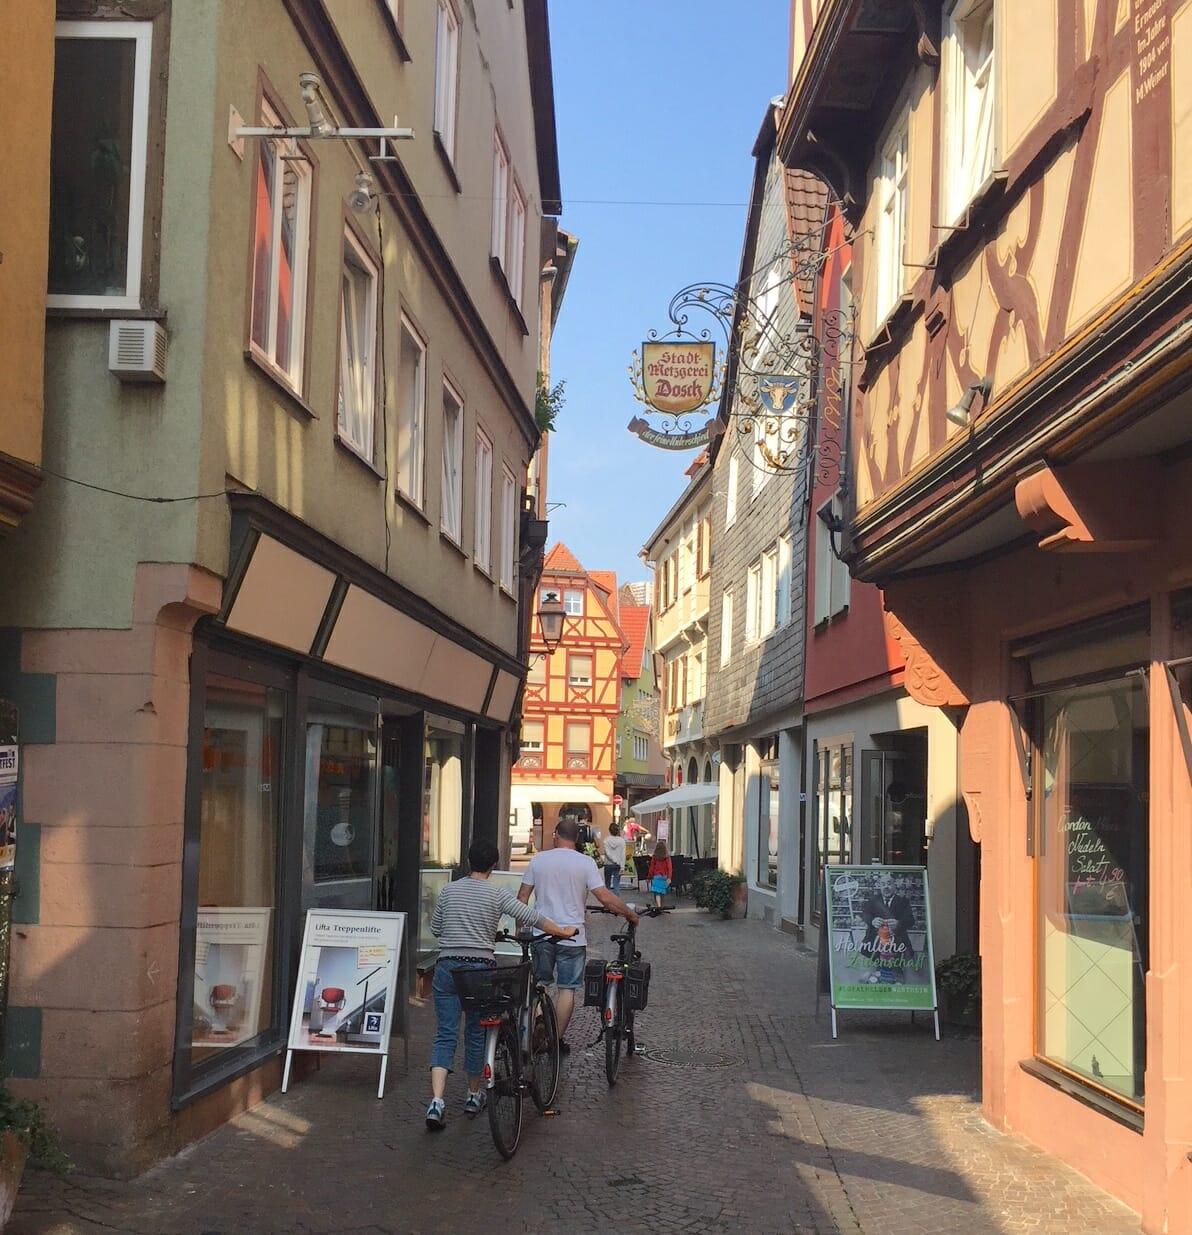 eBike, Radwanderung, Taubertal, Wertheim, Main